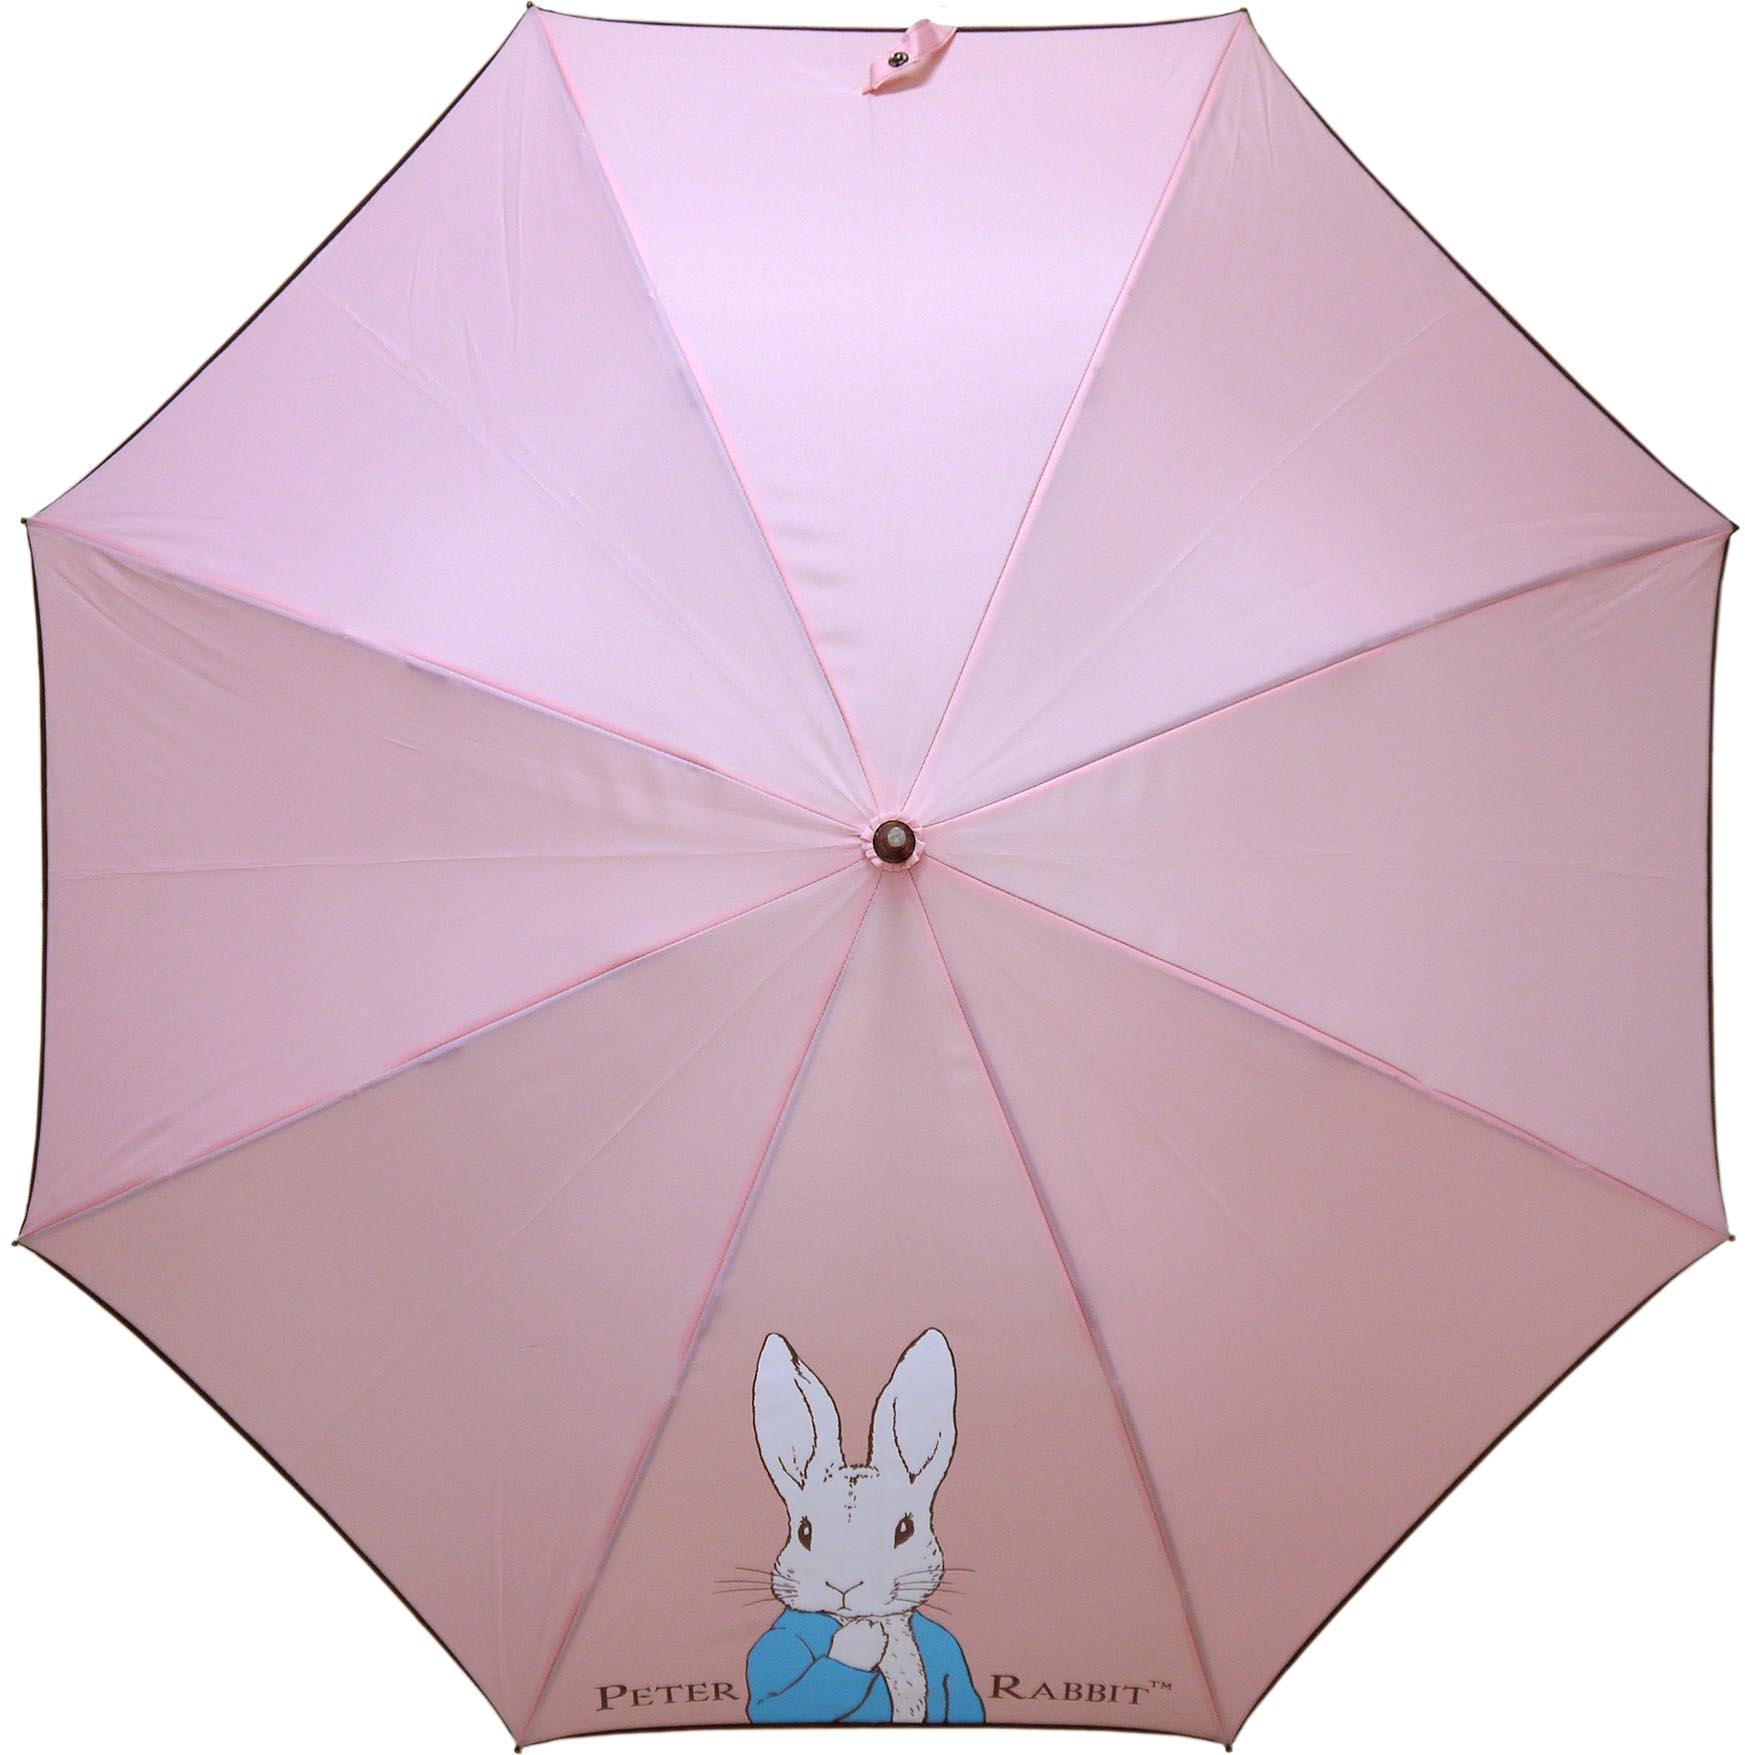 《Annie's Friends》Peter Rabbit 比得兔防曬直傘【典雅粉半身兔】